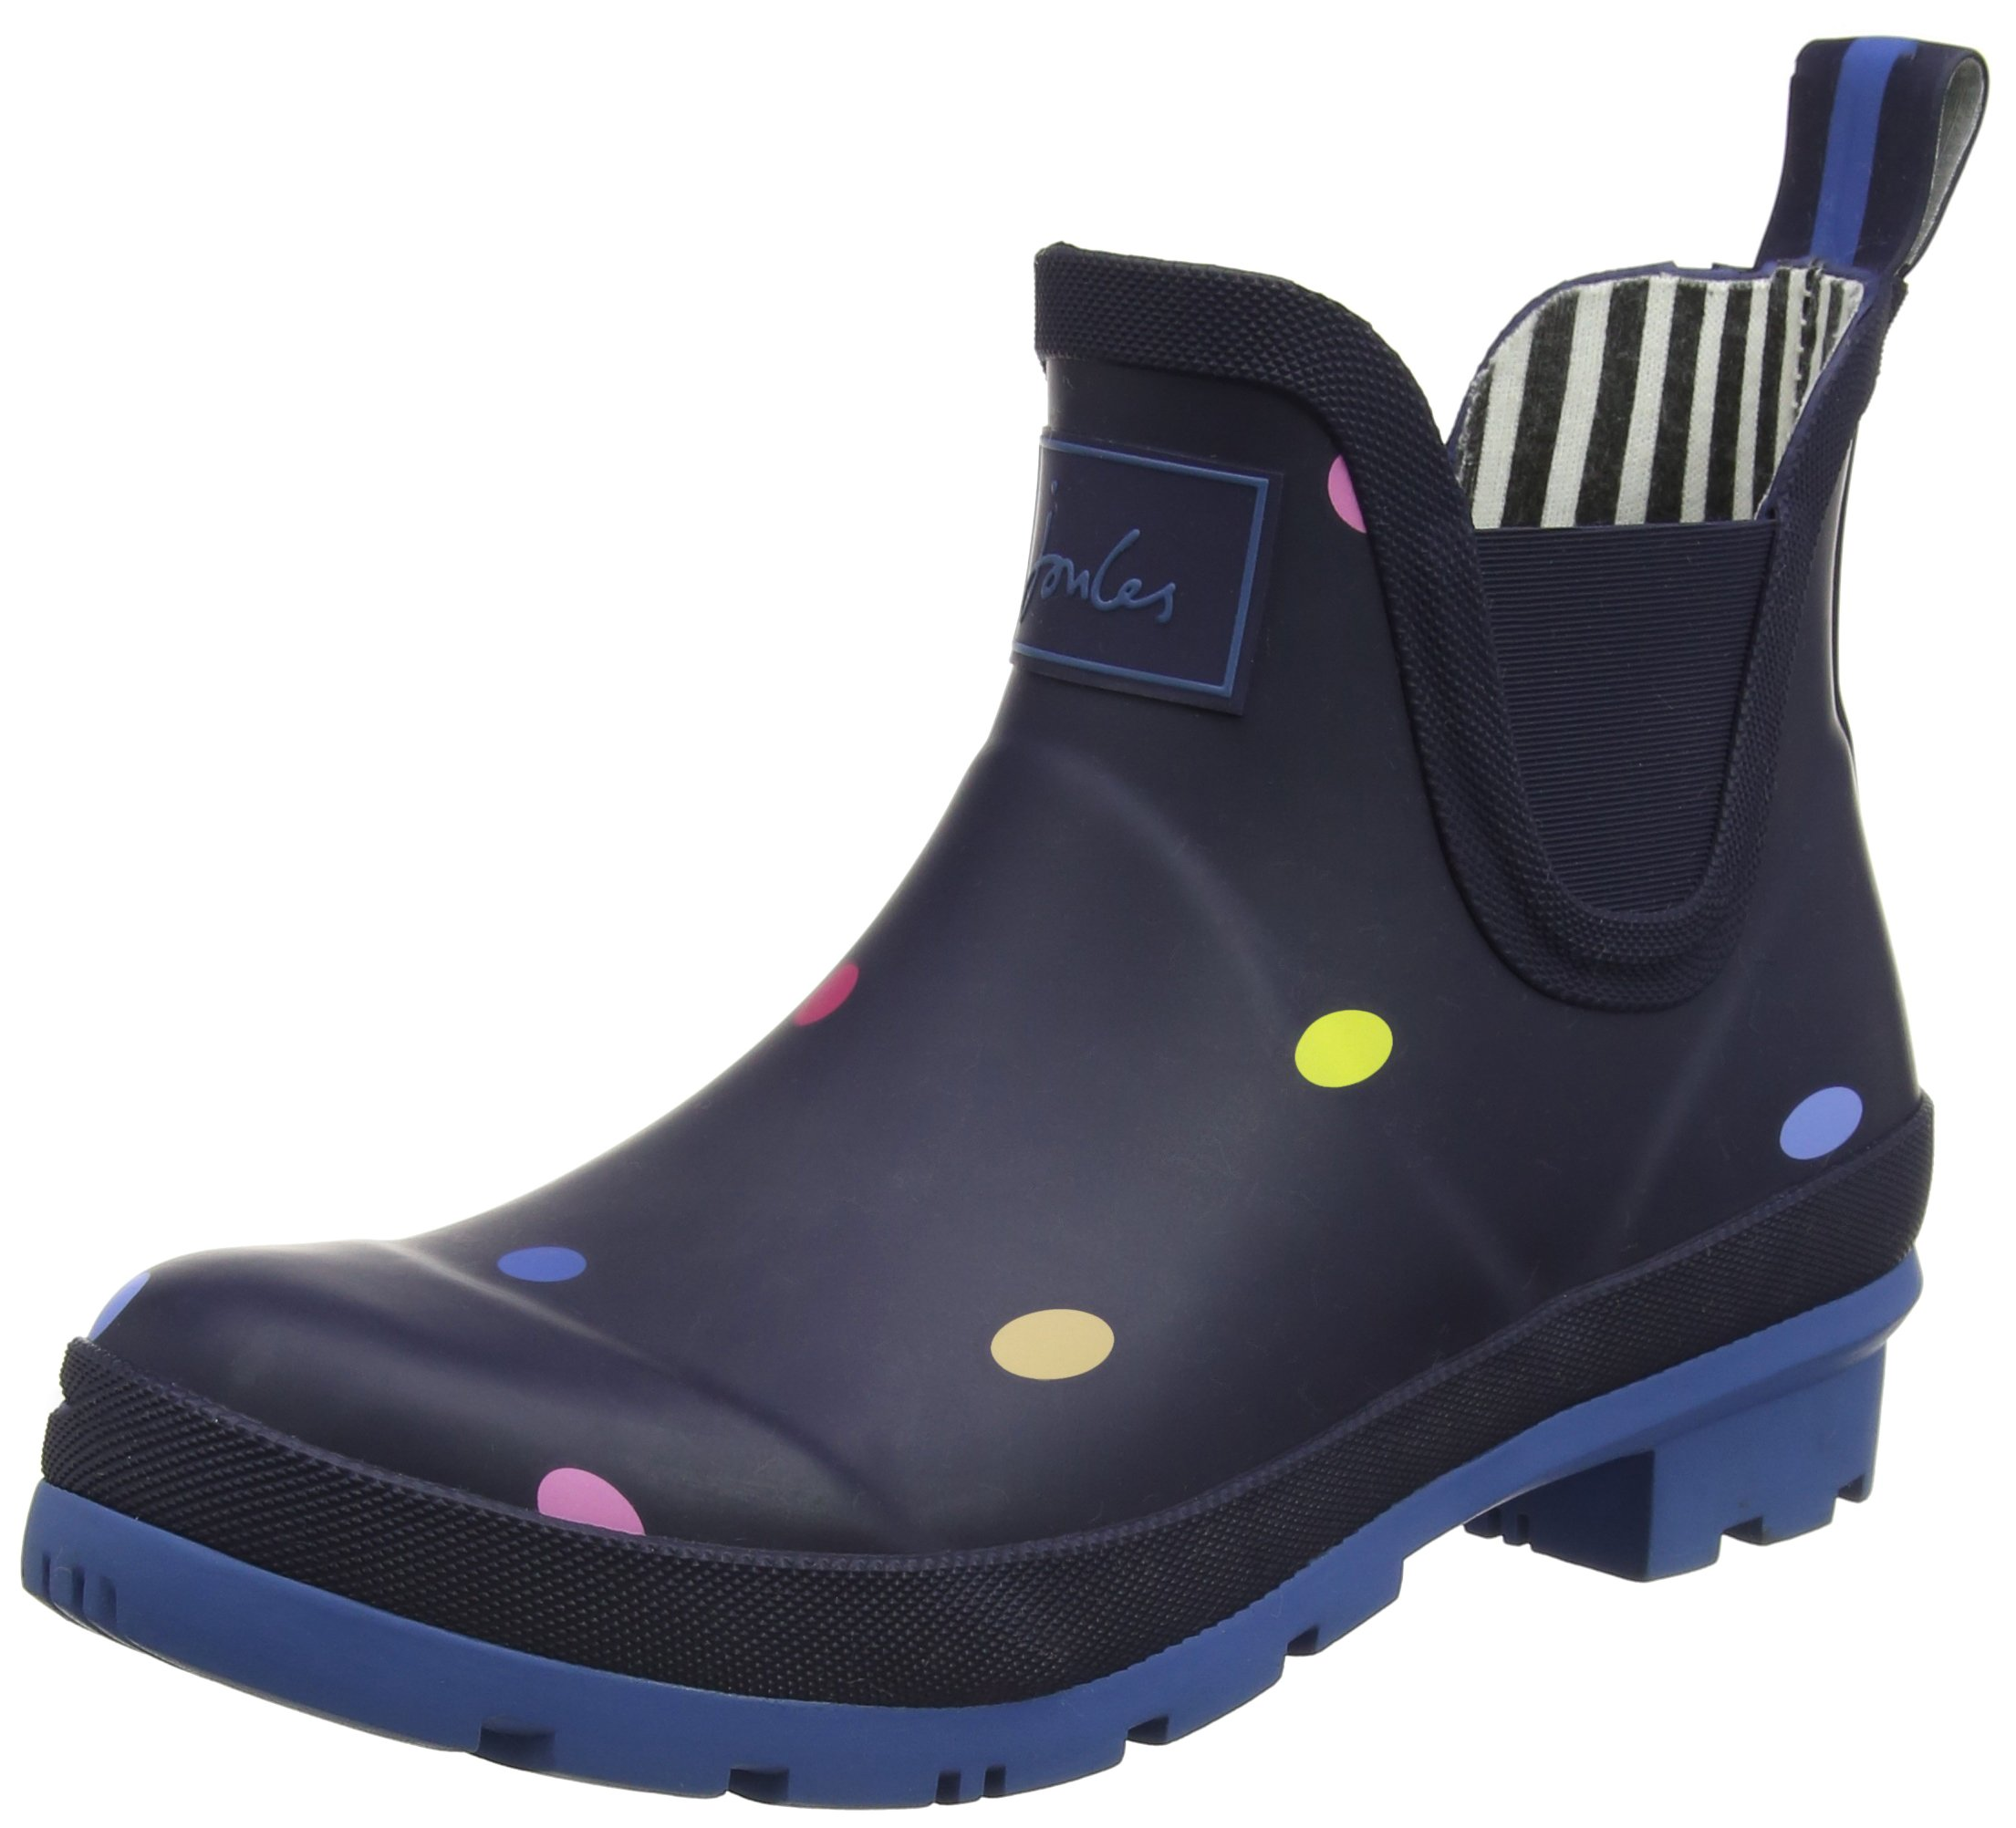 Joules Women's Wellibob Rain Boot, Navy pop spot, 6 Medium US